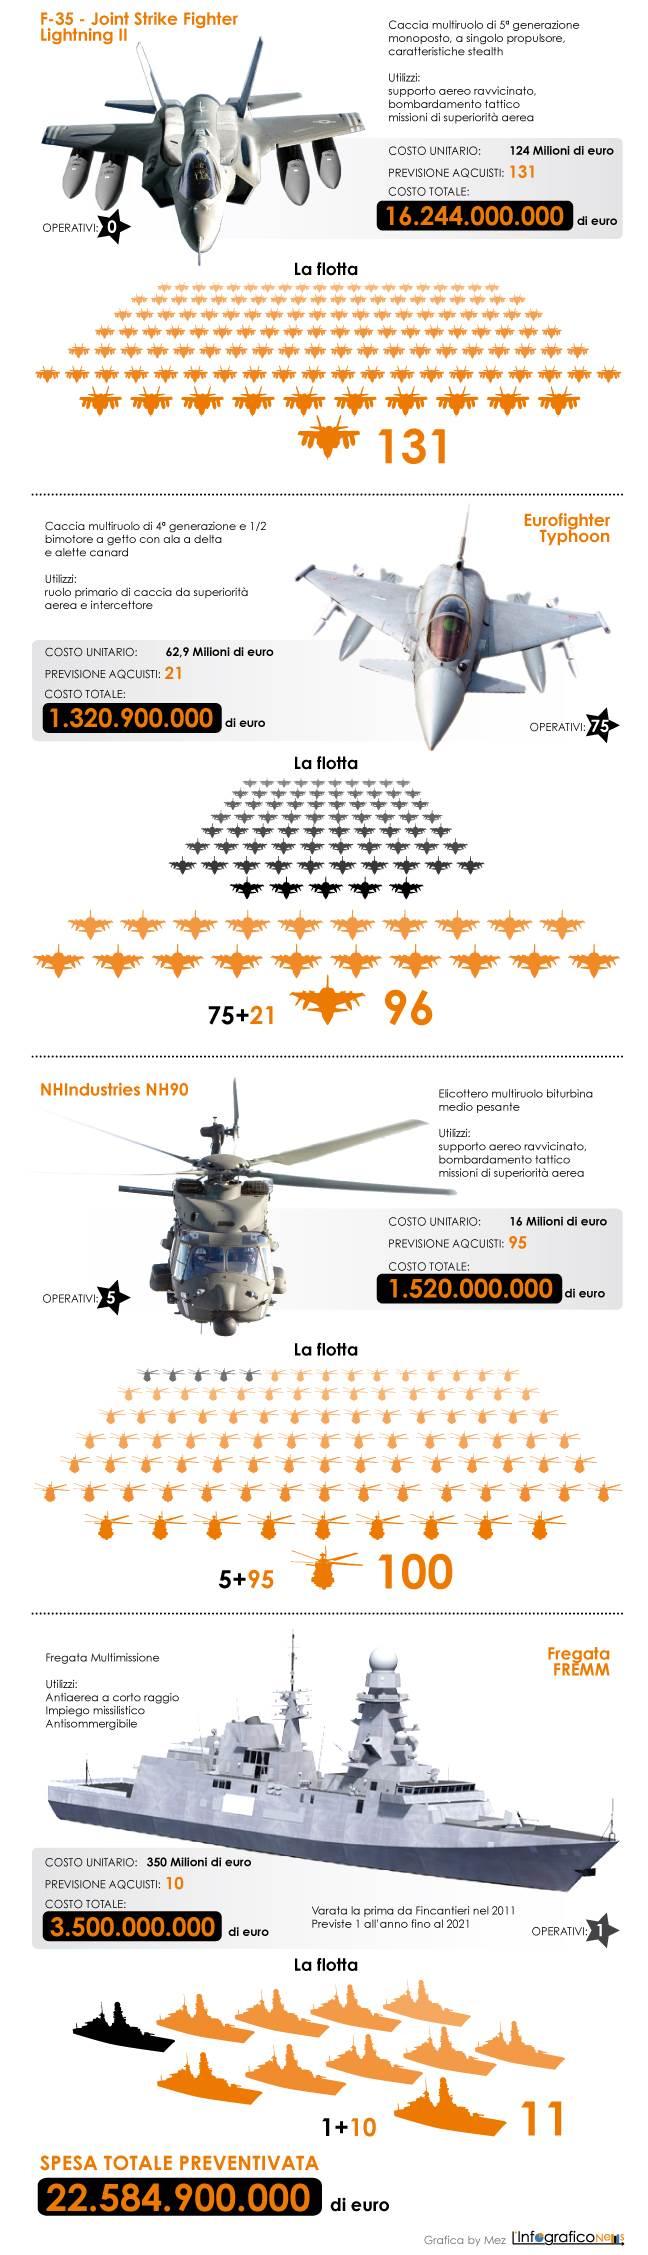 spese-militari-ITA